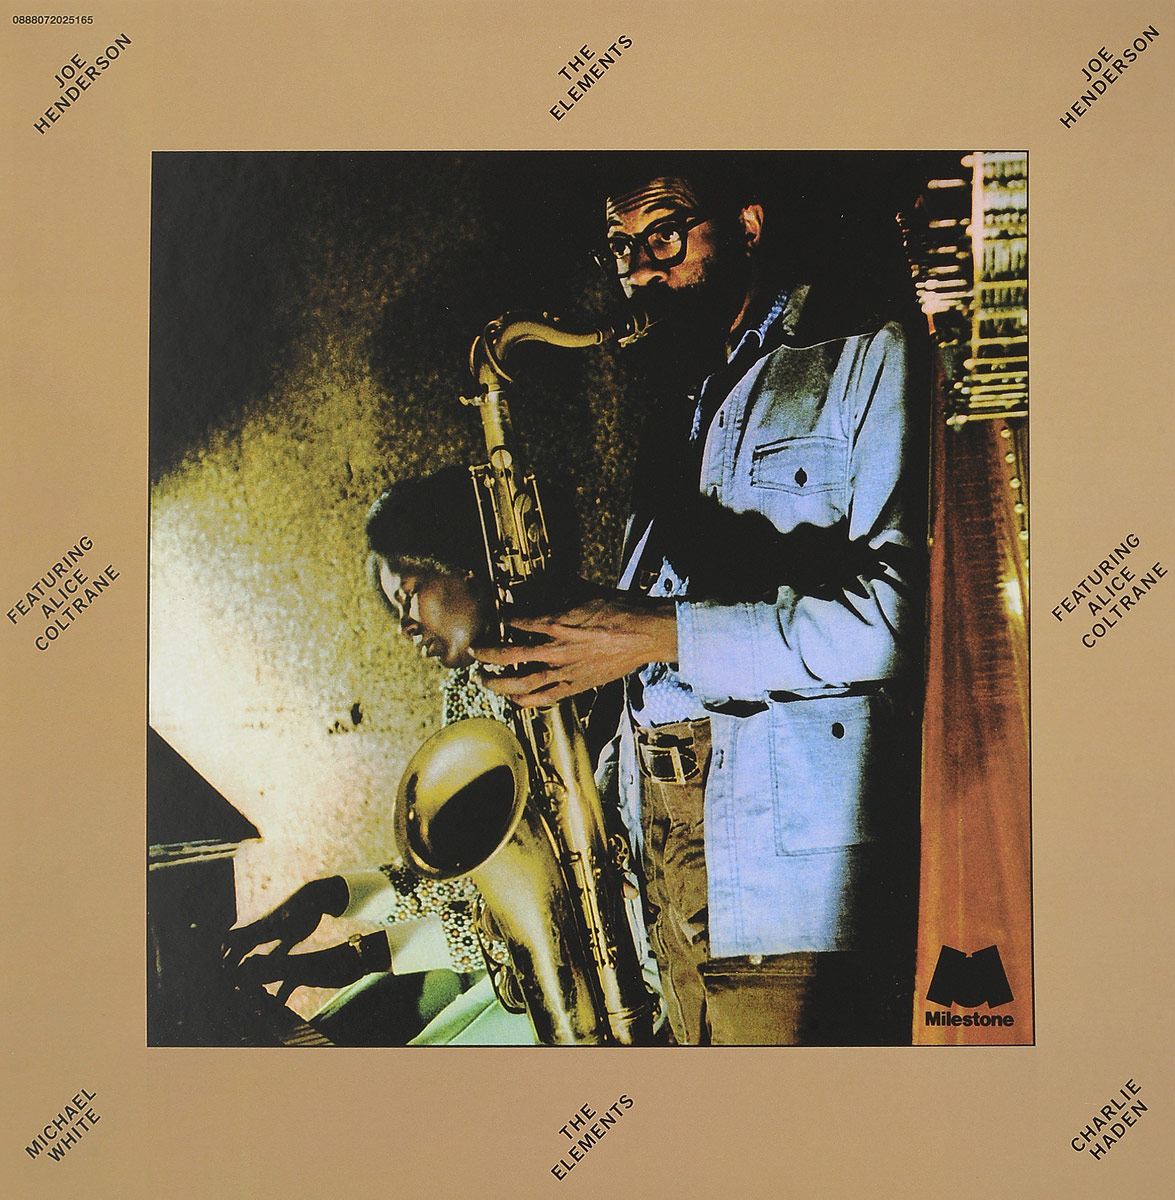 Джо Хендерсон,Элис Колтрейн Joe Henderson, Alice Coltrane. The Elements (LP) джо хендерсон joe henderson page one